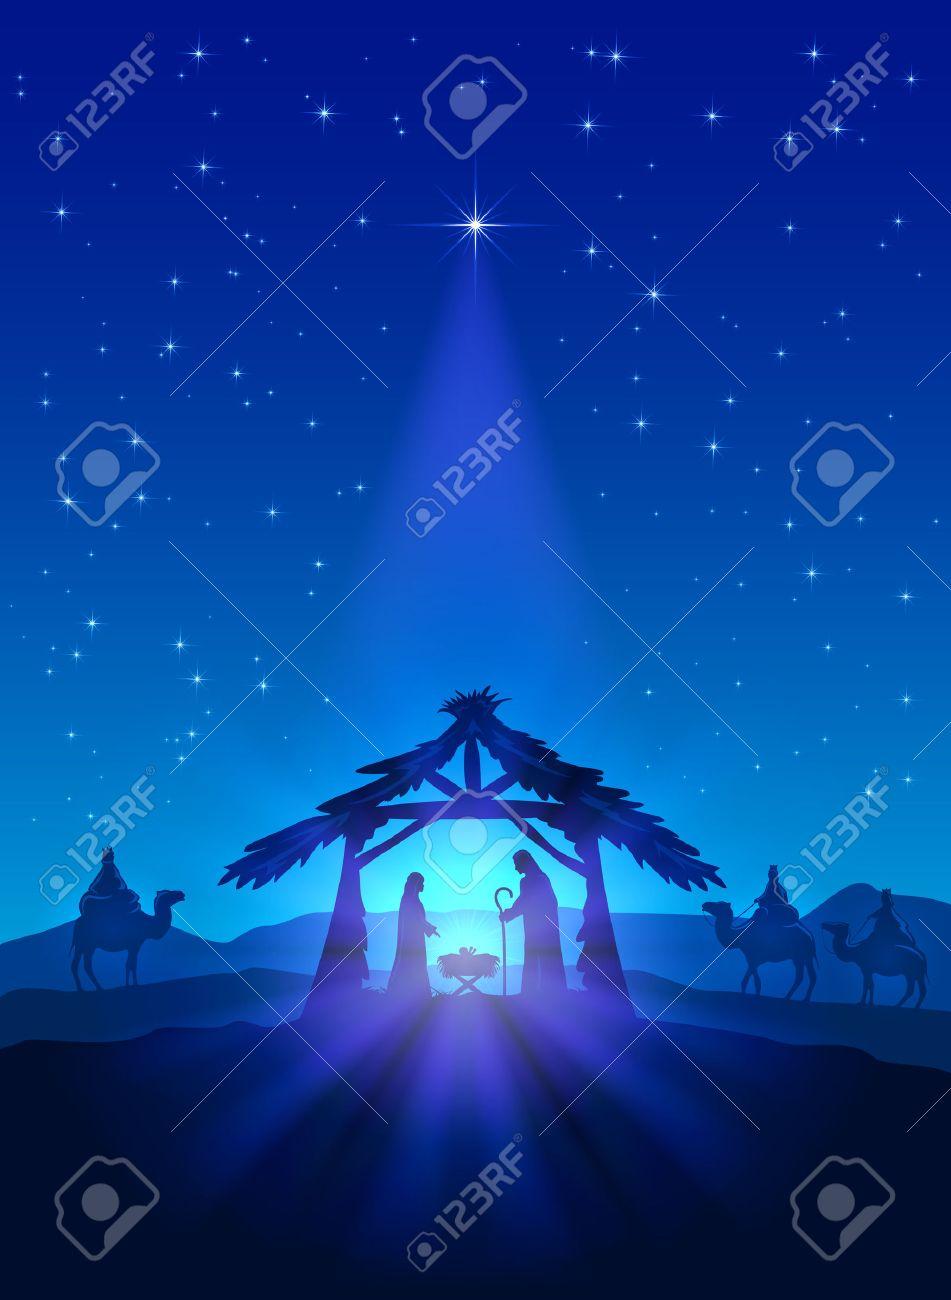 Fotos Del Nacimiento De Navidad.Tema Cristao Estrela Do Natal No Ceu Azul E Nascimento De Jesus Ilustracao